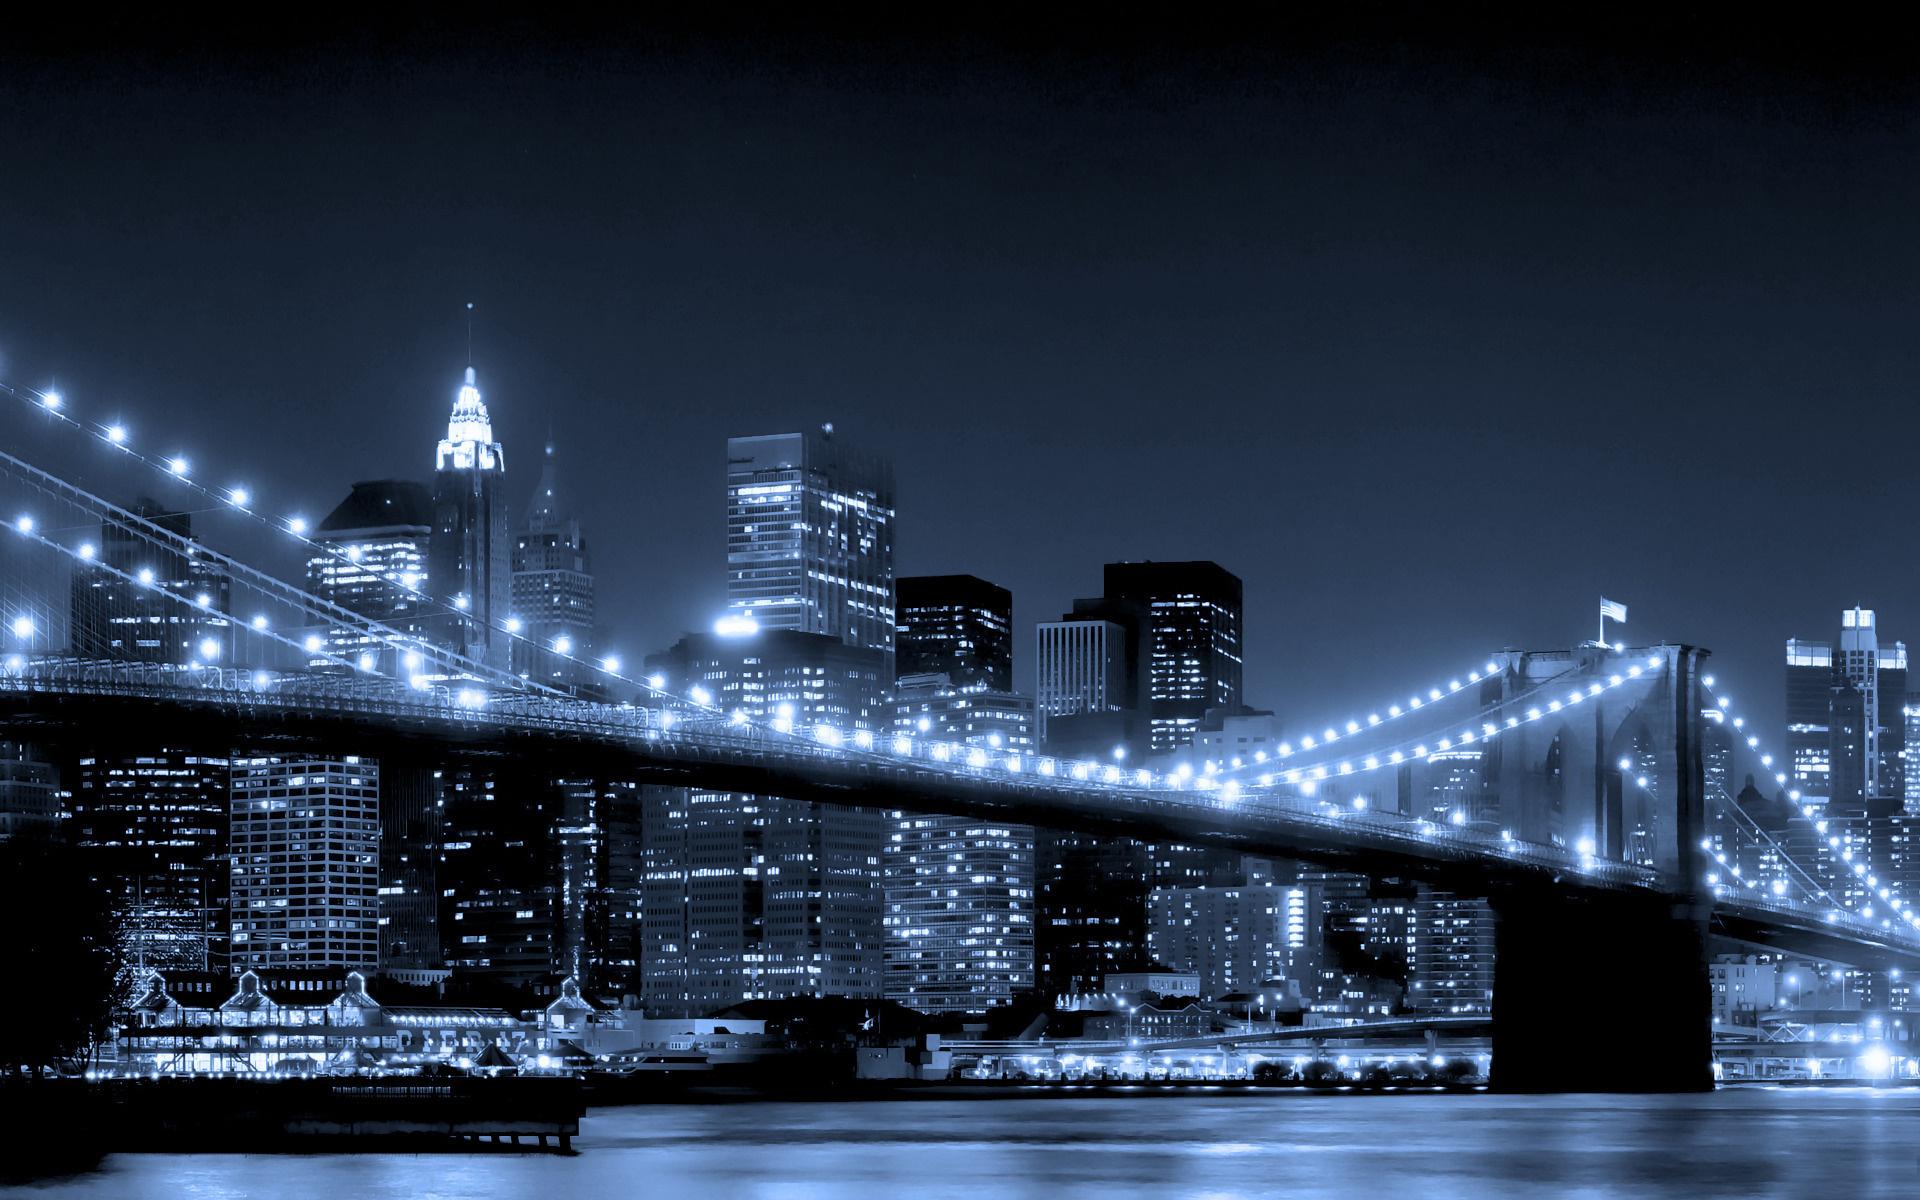 Illuminated Bridge at Night